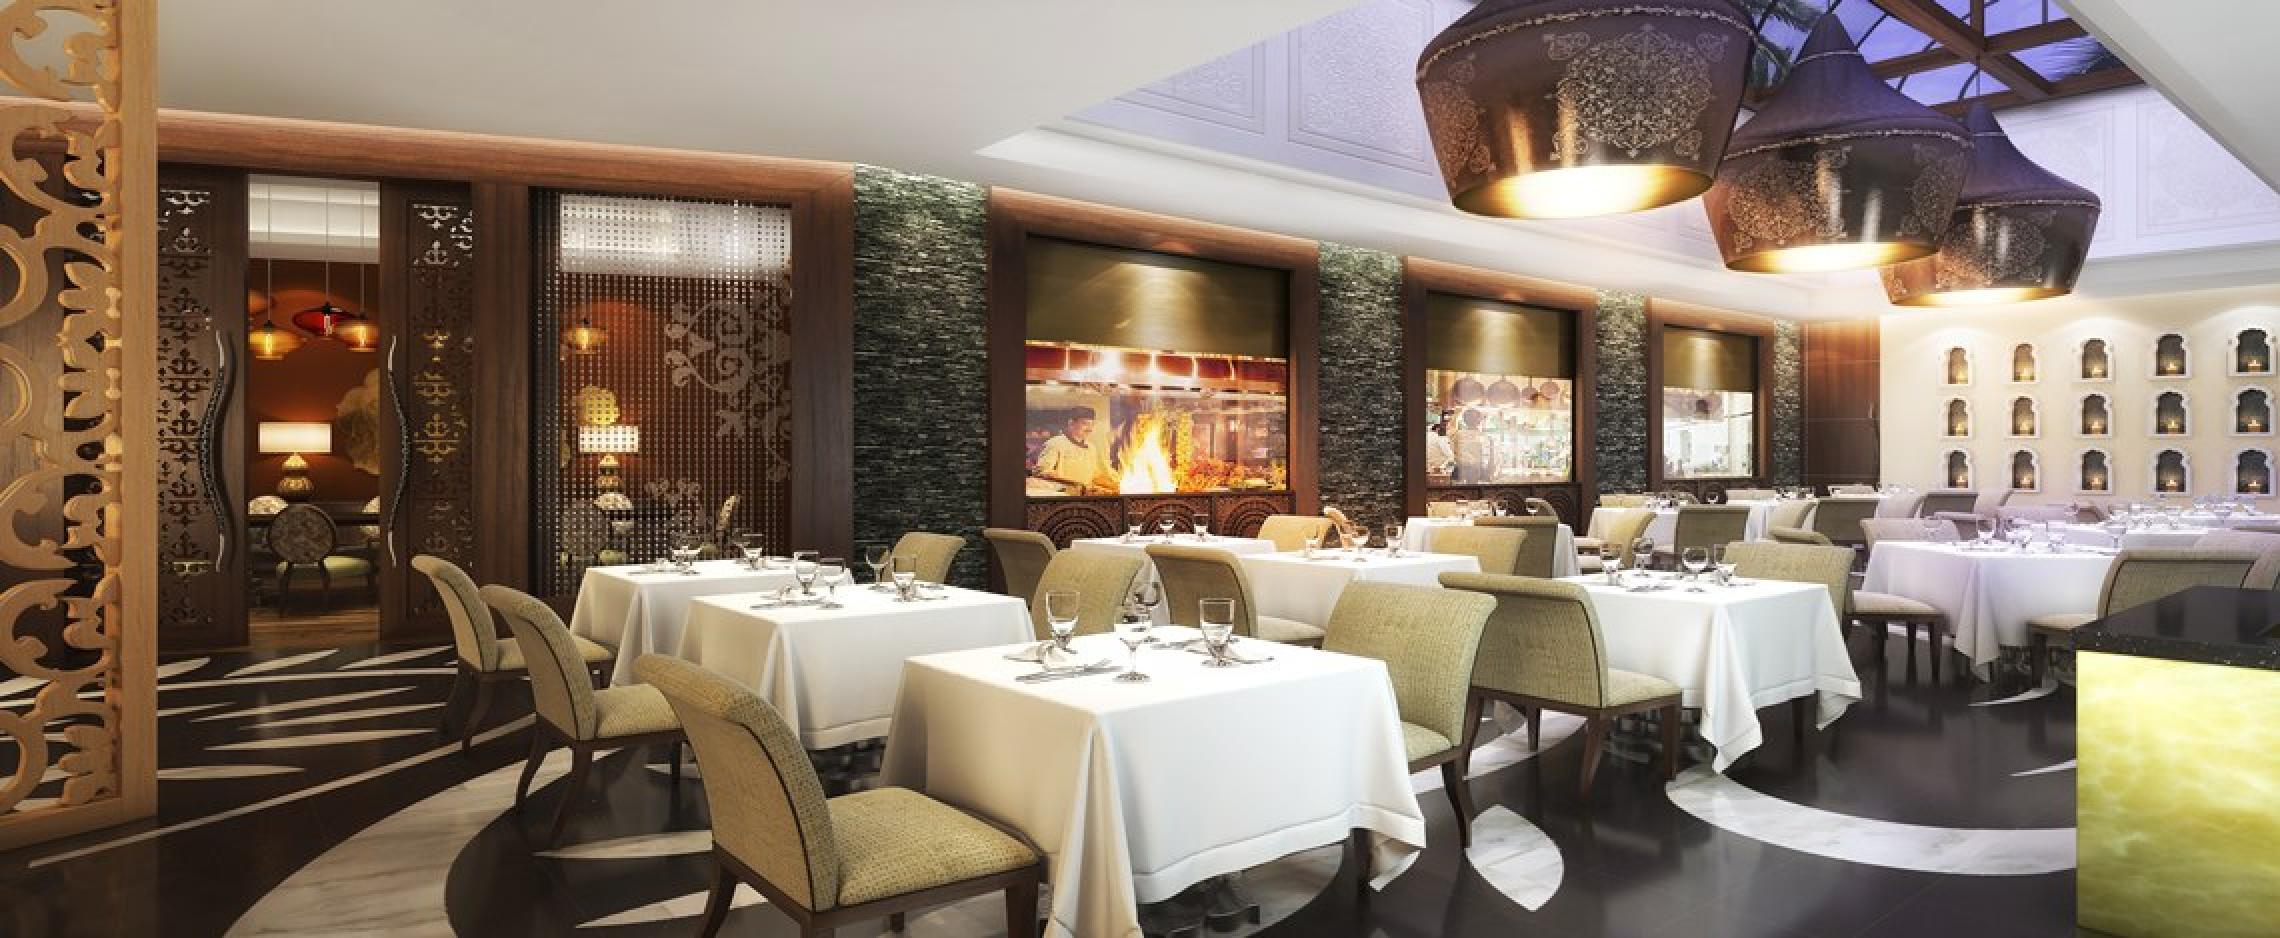 Rasoi by vineet luxury star accomodation in bahrain